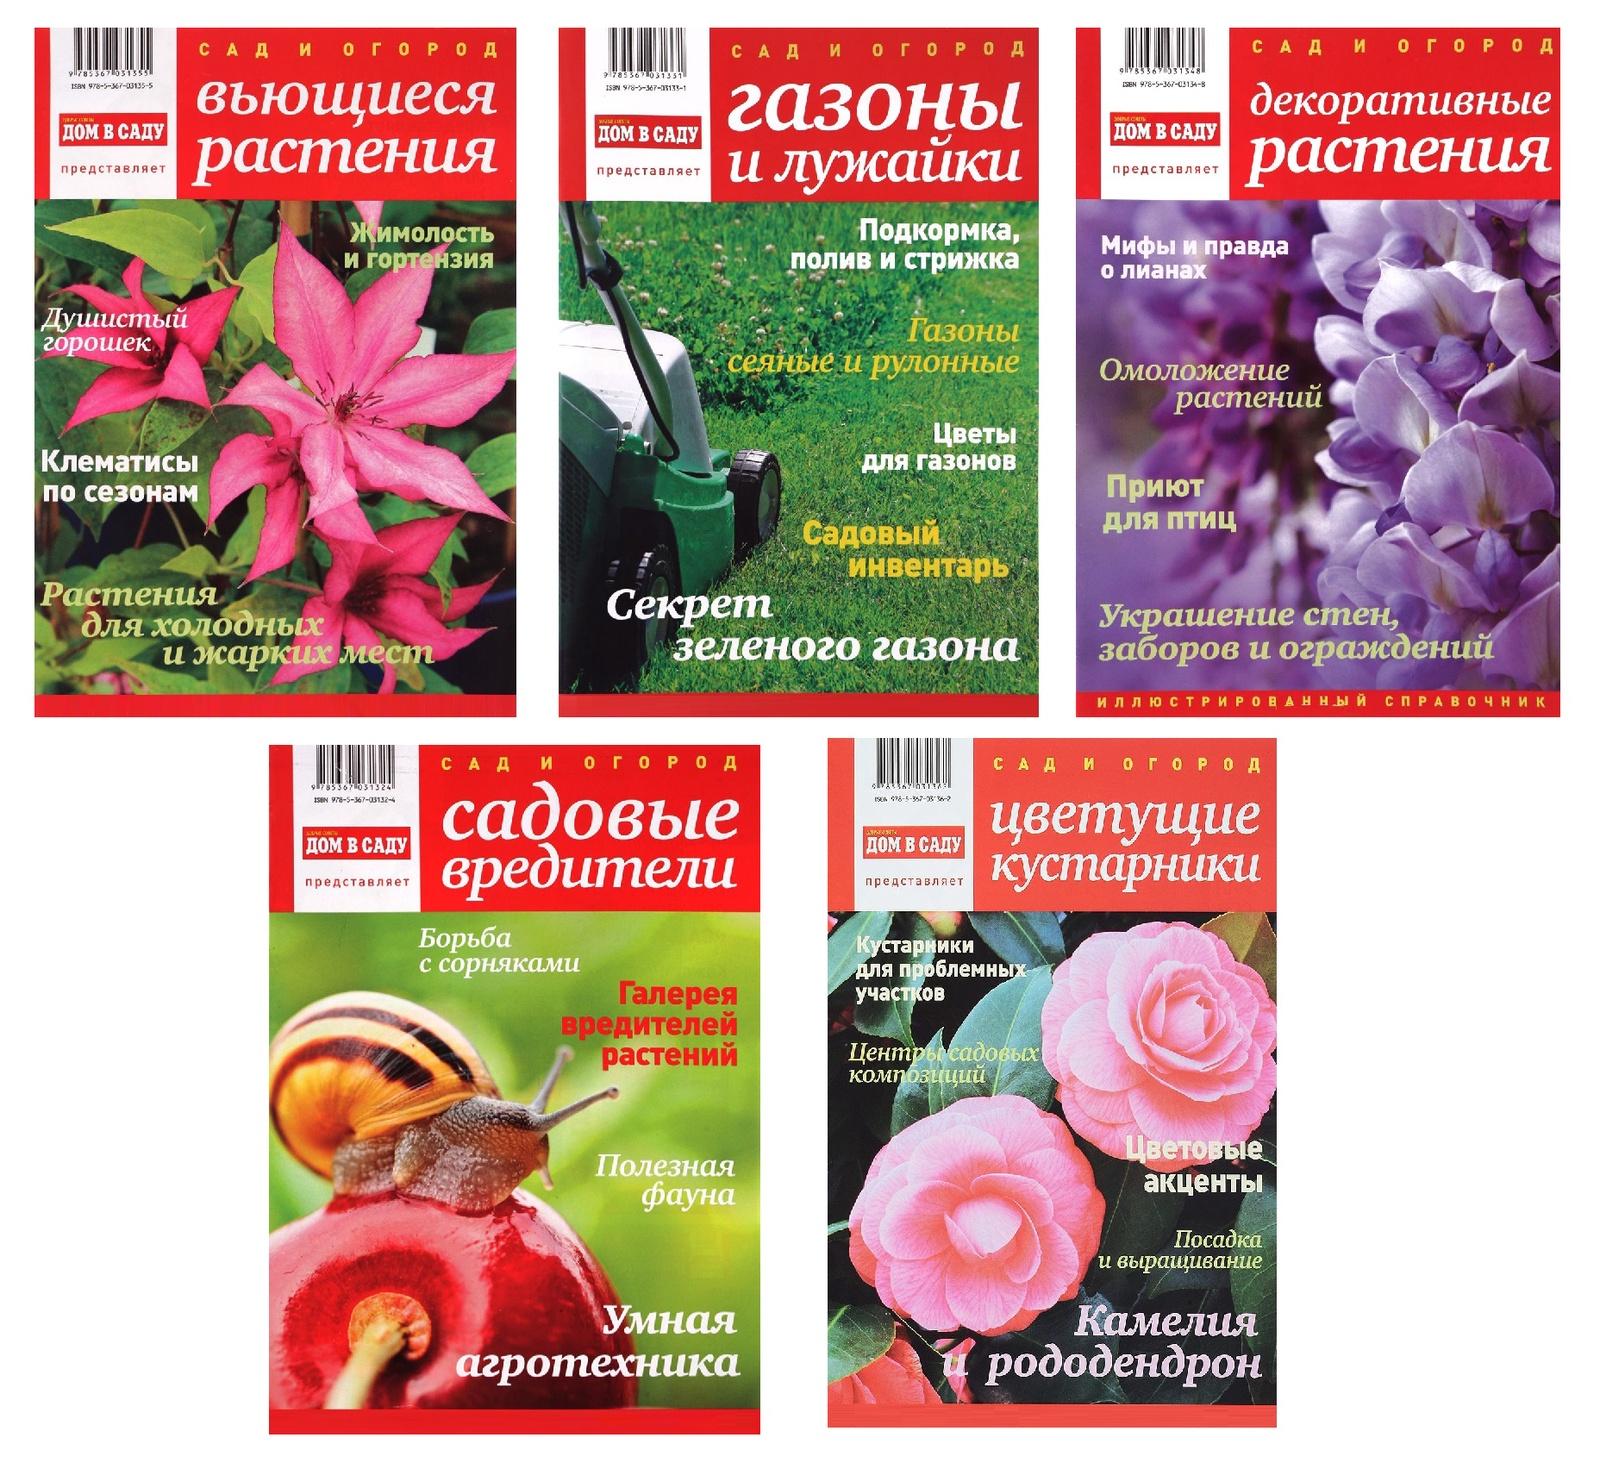 Набор книг Сад и Огород 12, 5 шт. сад и огород